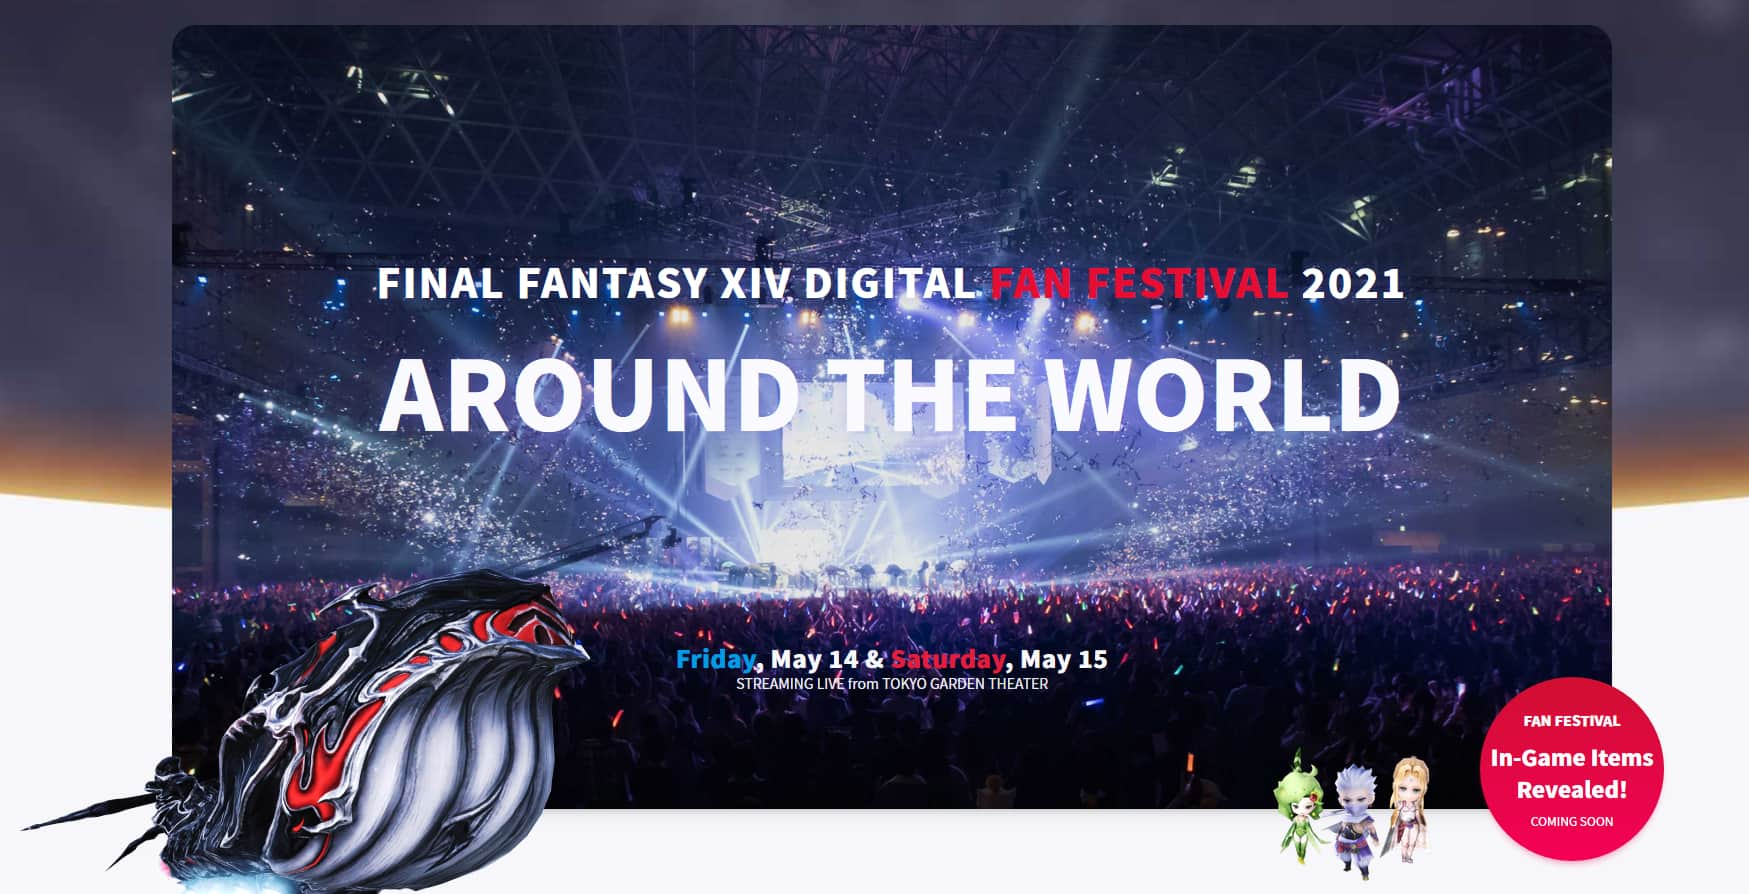 Final Fantasy XIV Digital Fanfest Kicks Off May 14th 5